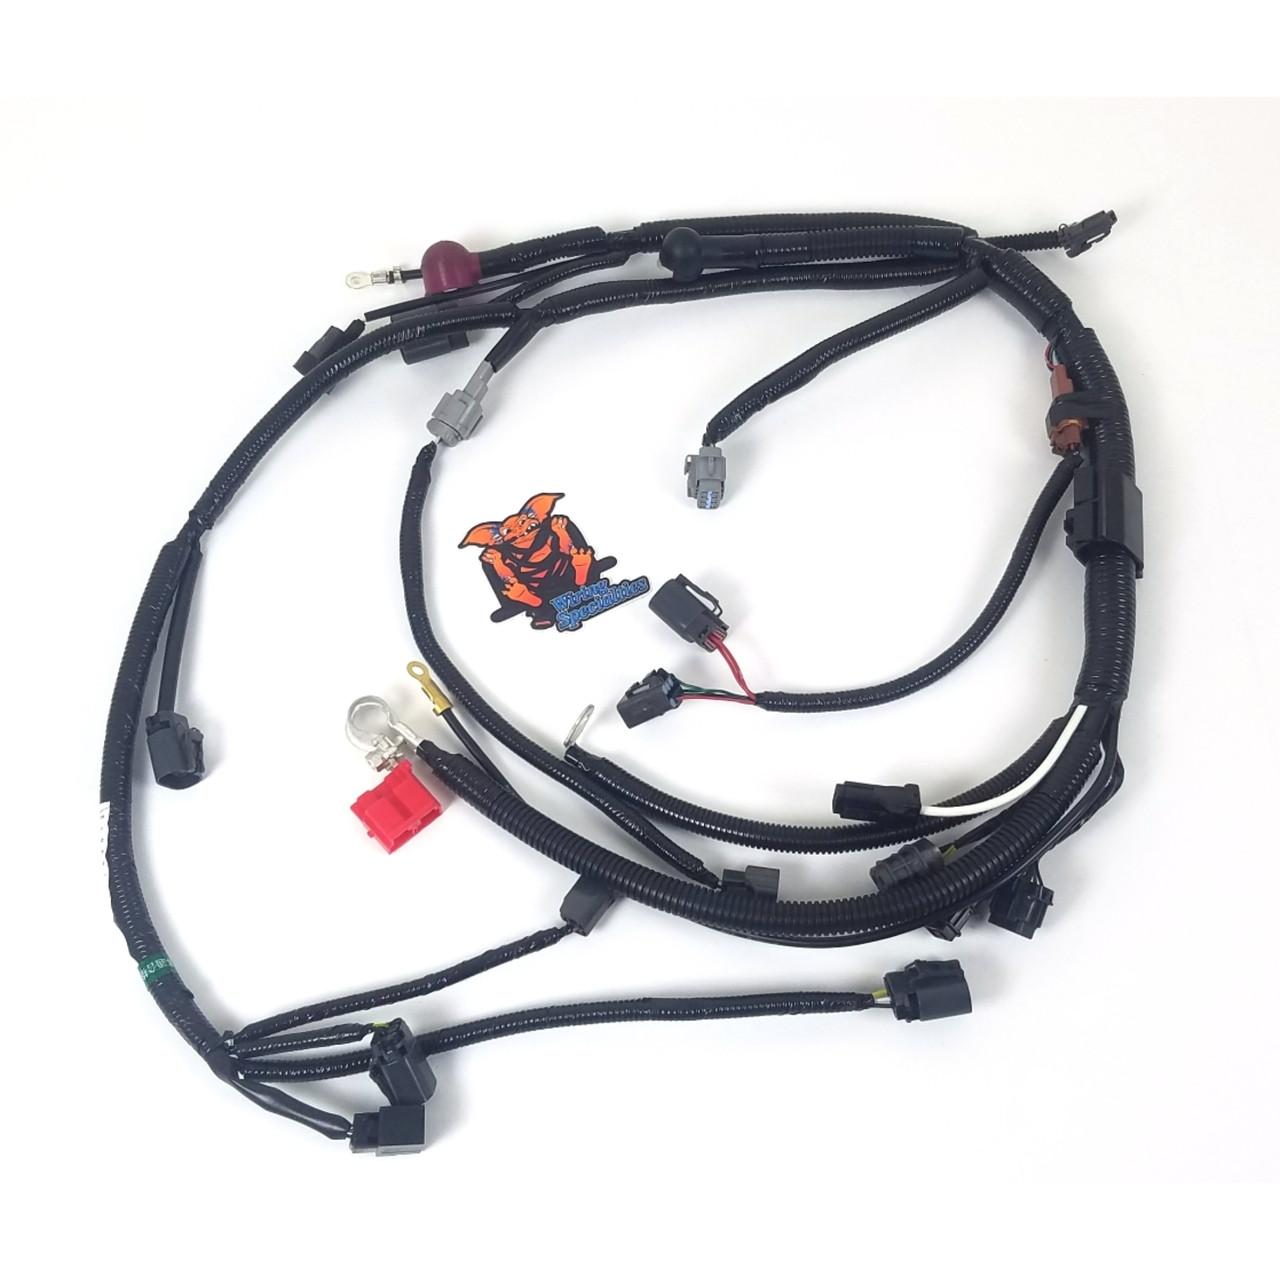 Strange Nissan 240Sx S14 Sr20Det Transmission Harness Wiring Specialties Wiring Digital Resources Funapmognl